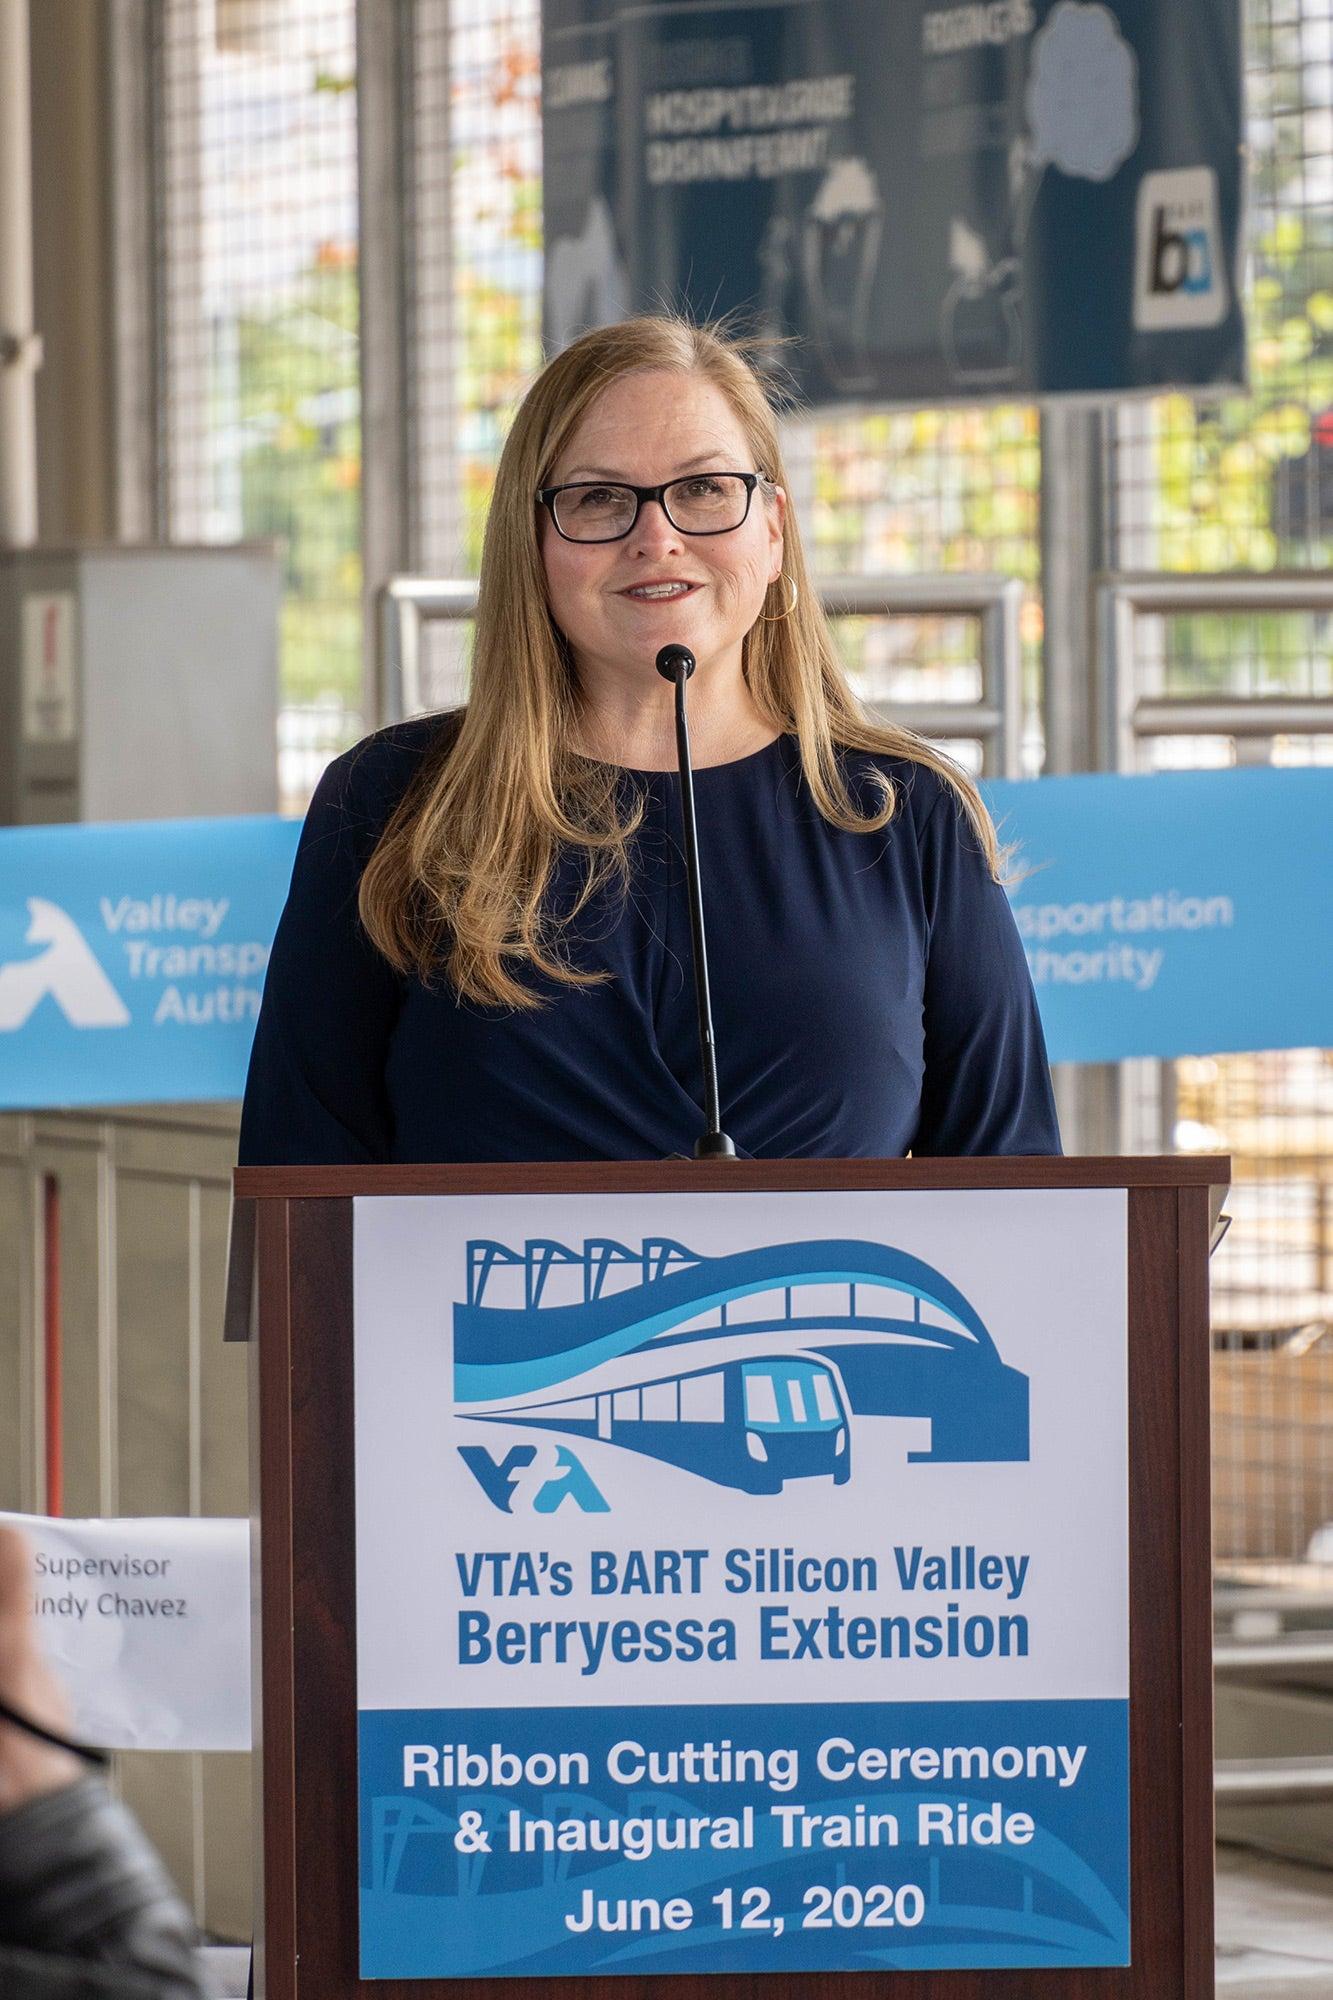 Cindy Chavez. Photo: Santa Clara Valley Transportation Authority